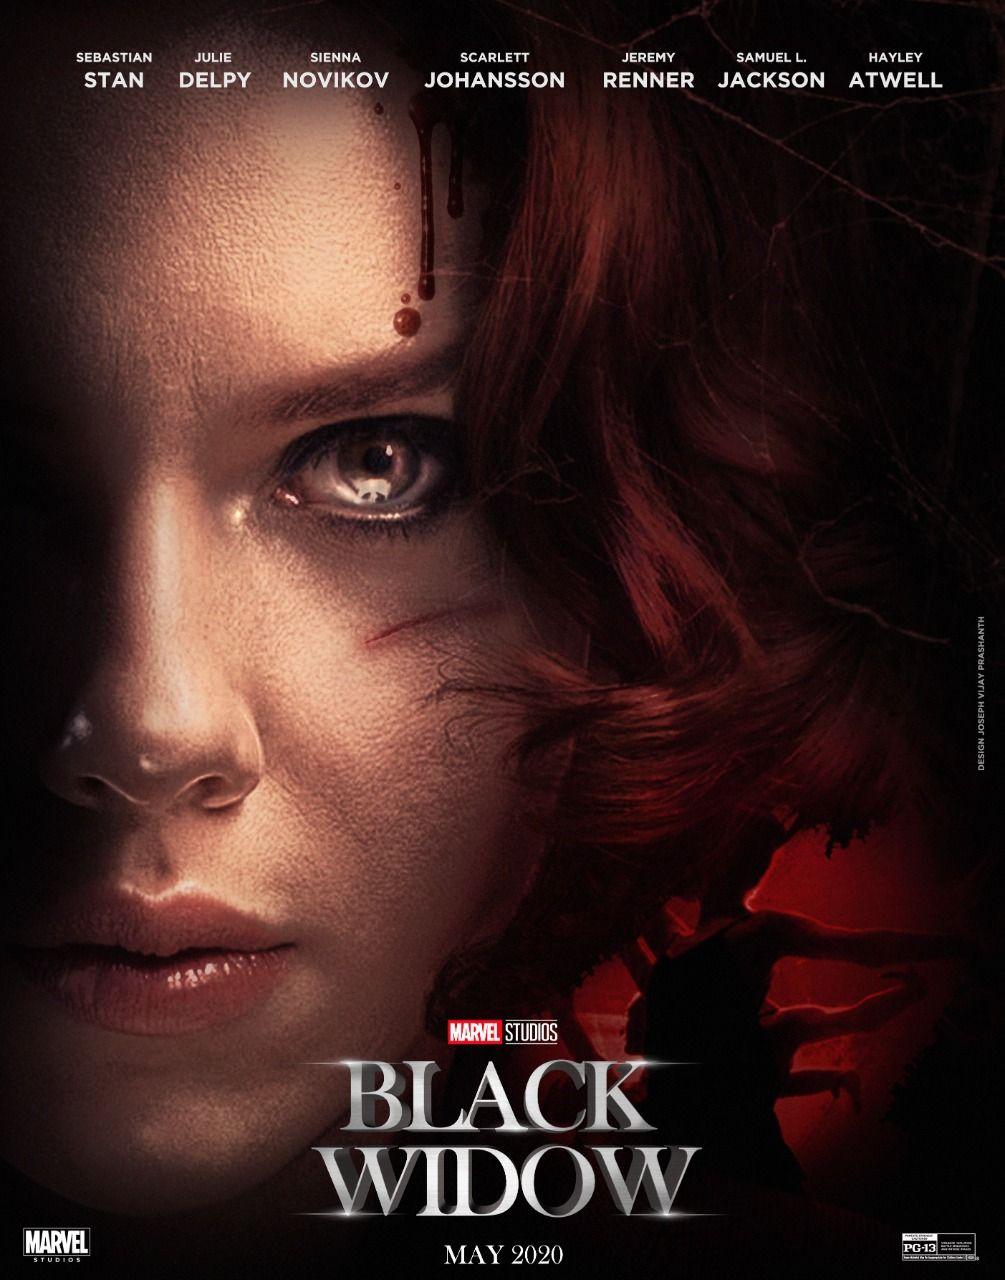 Black Widow Movie Poster Design Phase4 Marvel